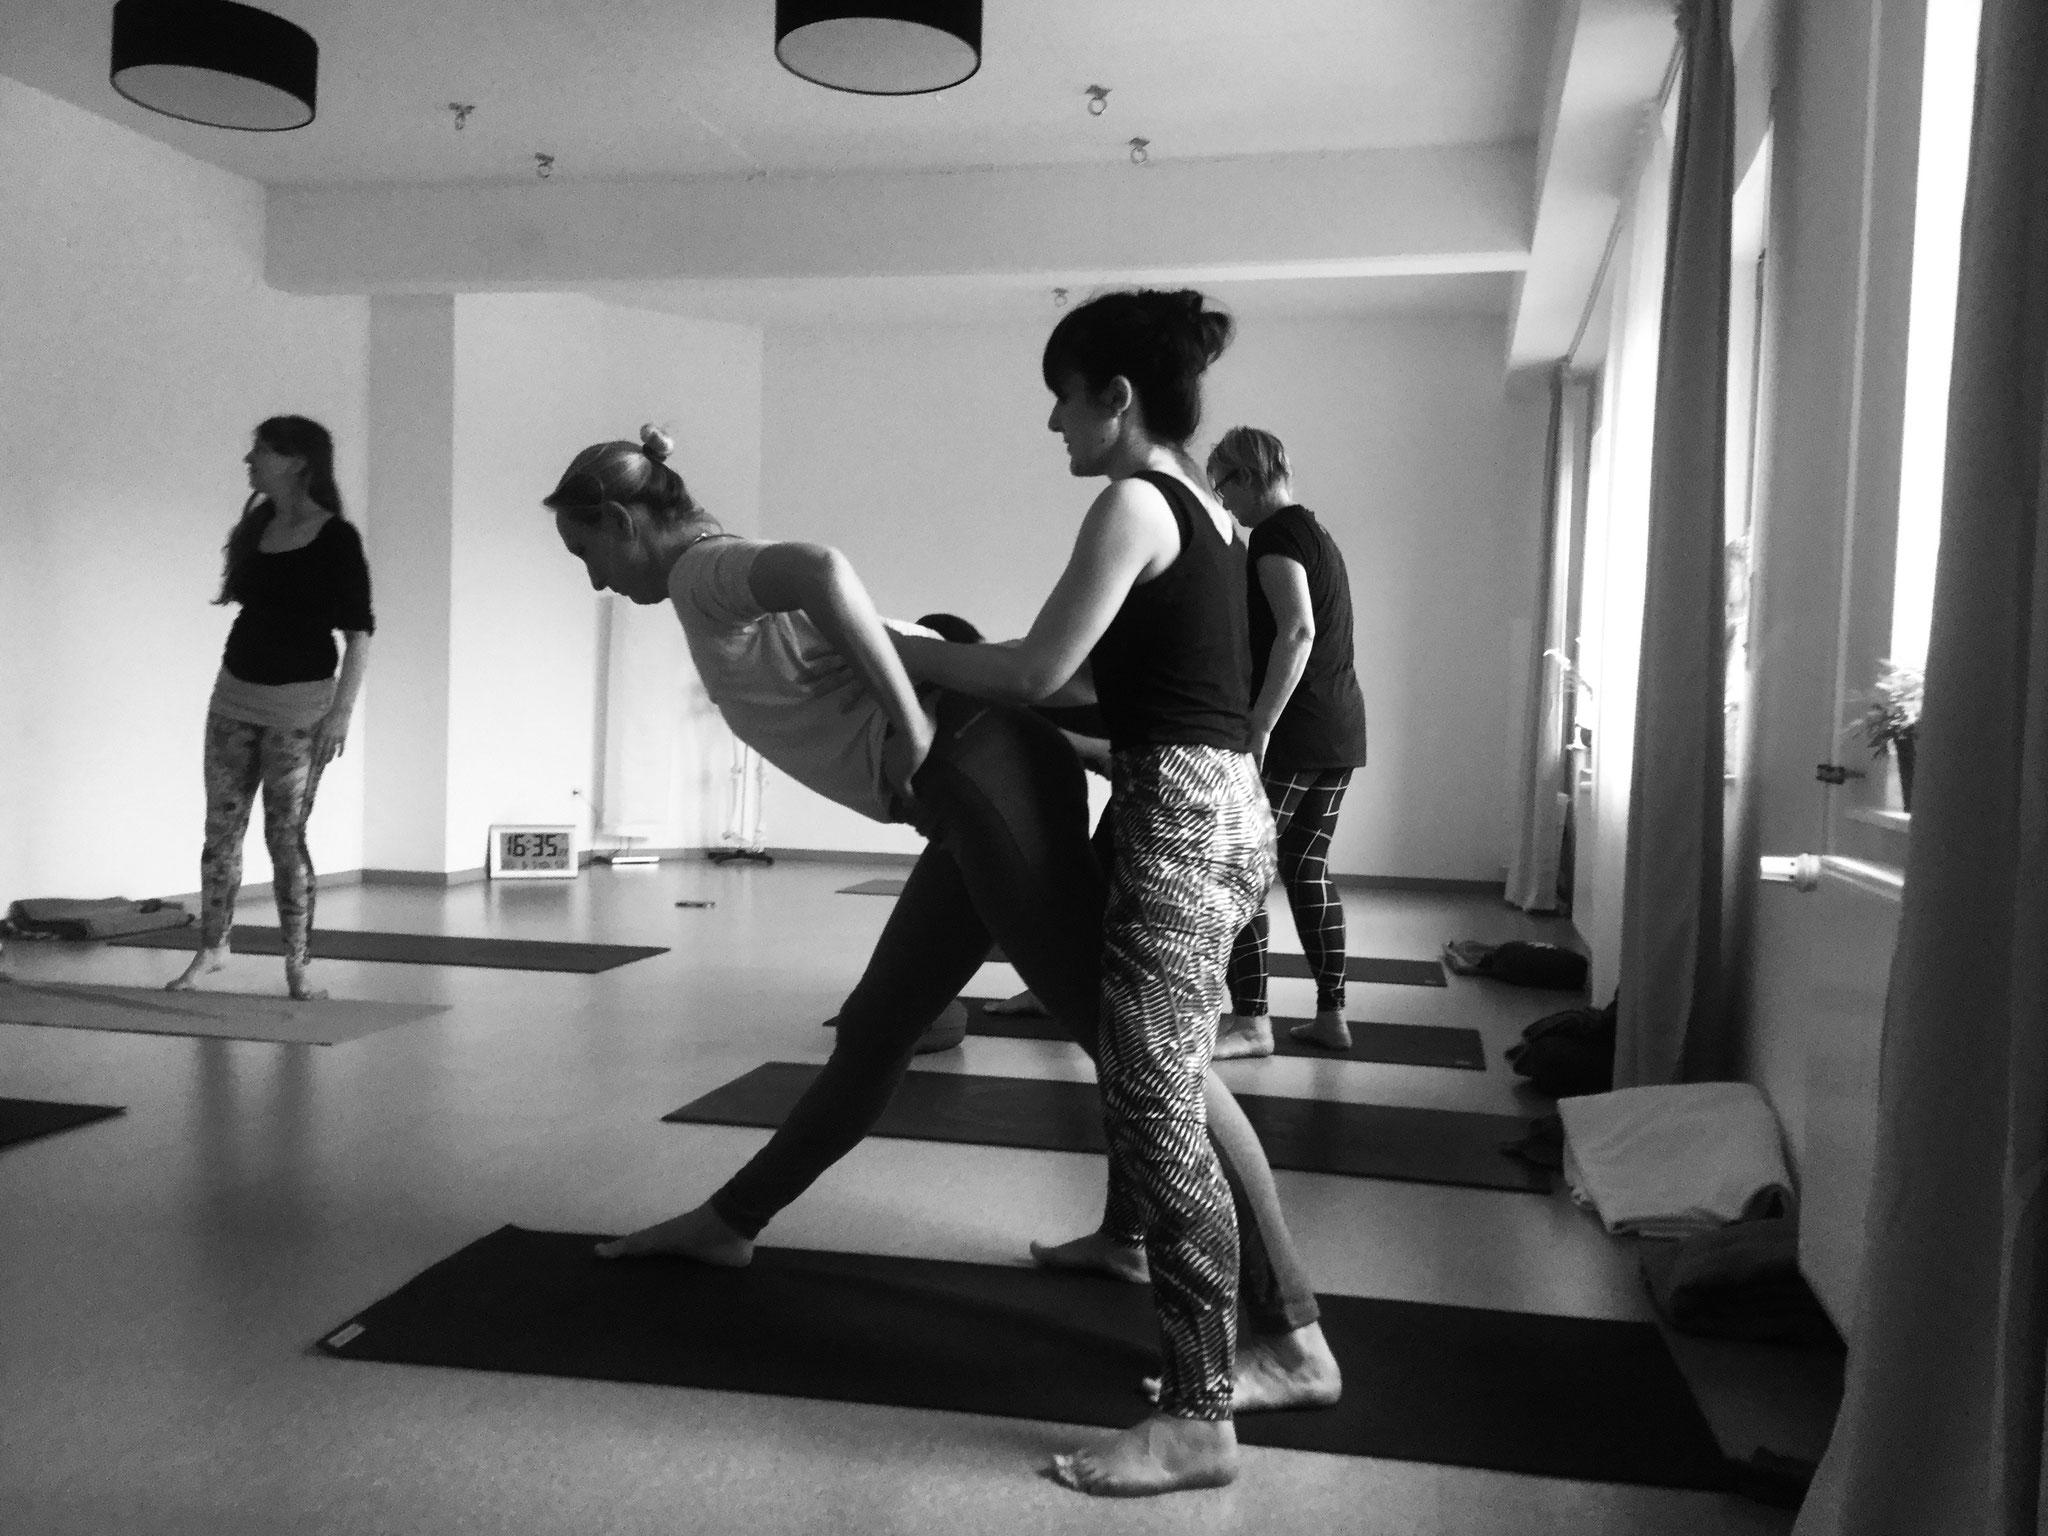 Yoga Asanas korrigieren im Chuck Miller Workshop bei Yamida - Yogaschule Lüdinghausen